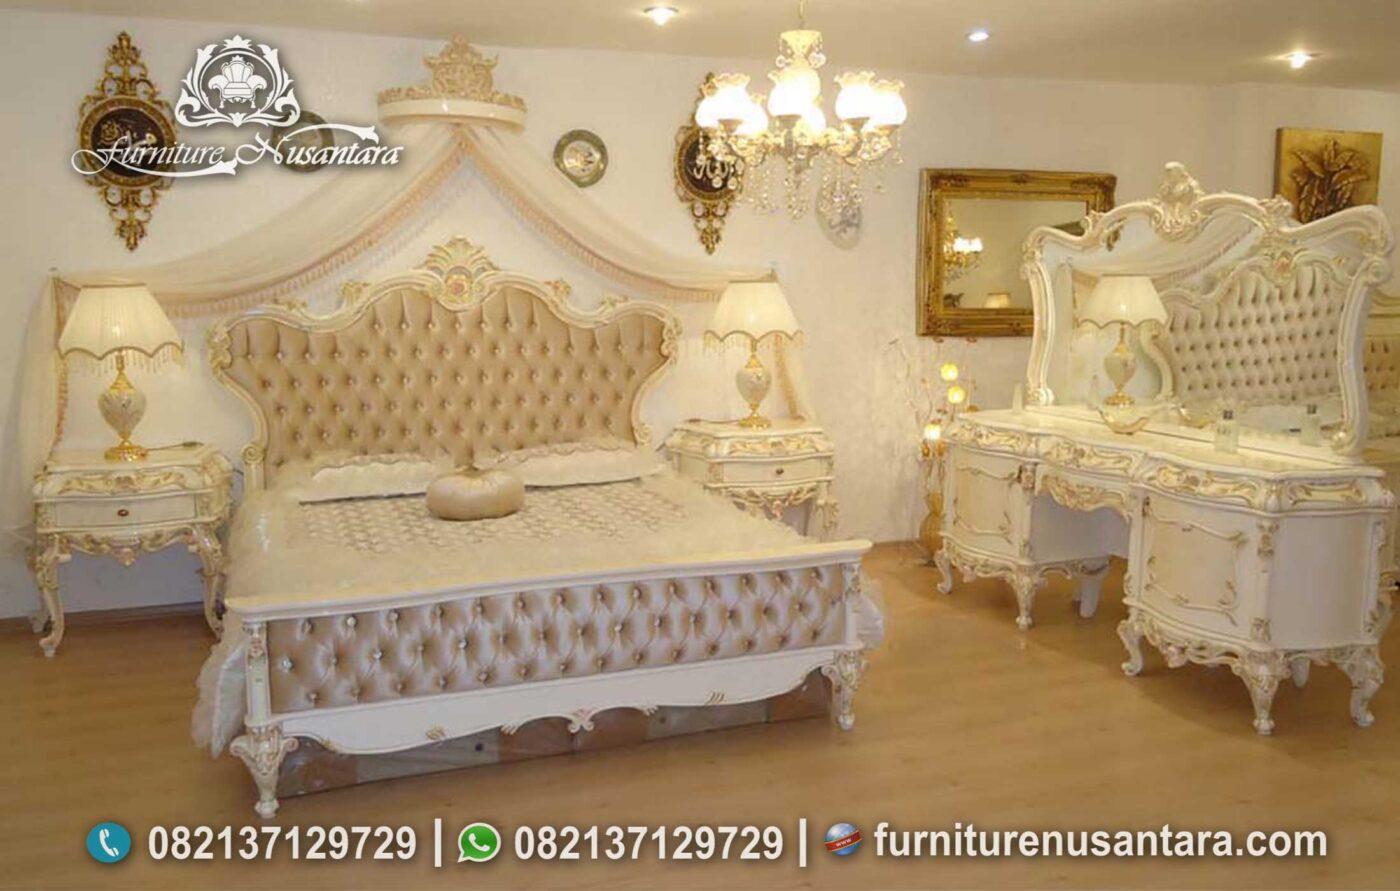 Kamar Pengantin Baru Modern KS-110, Furniture Nusantara